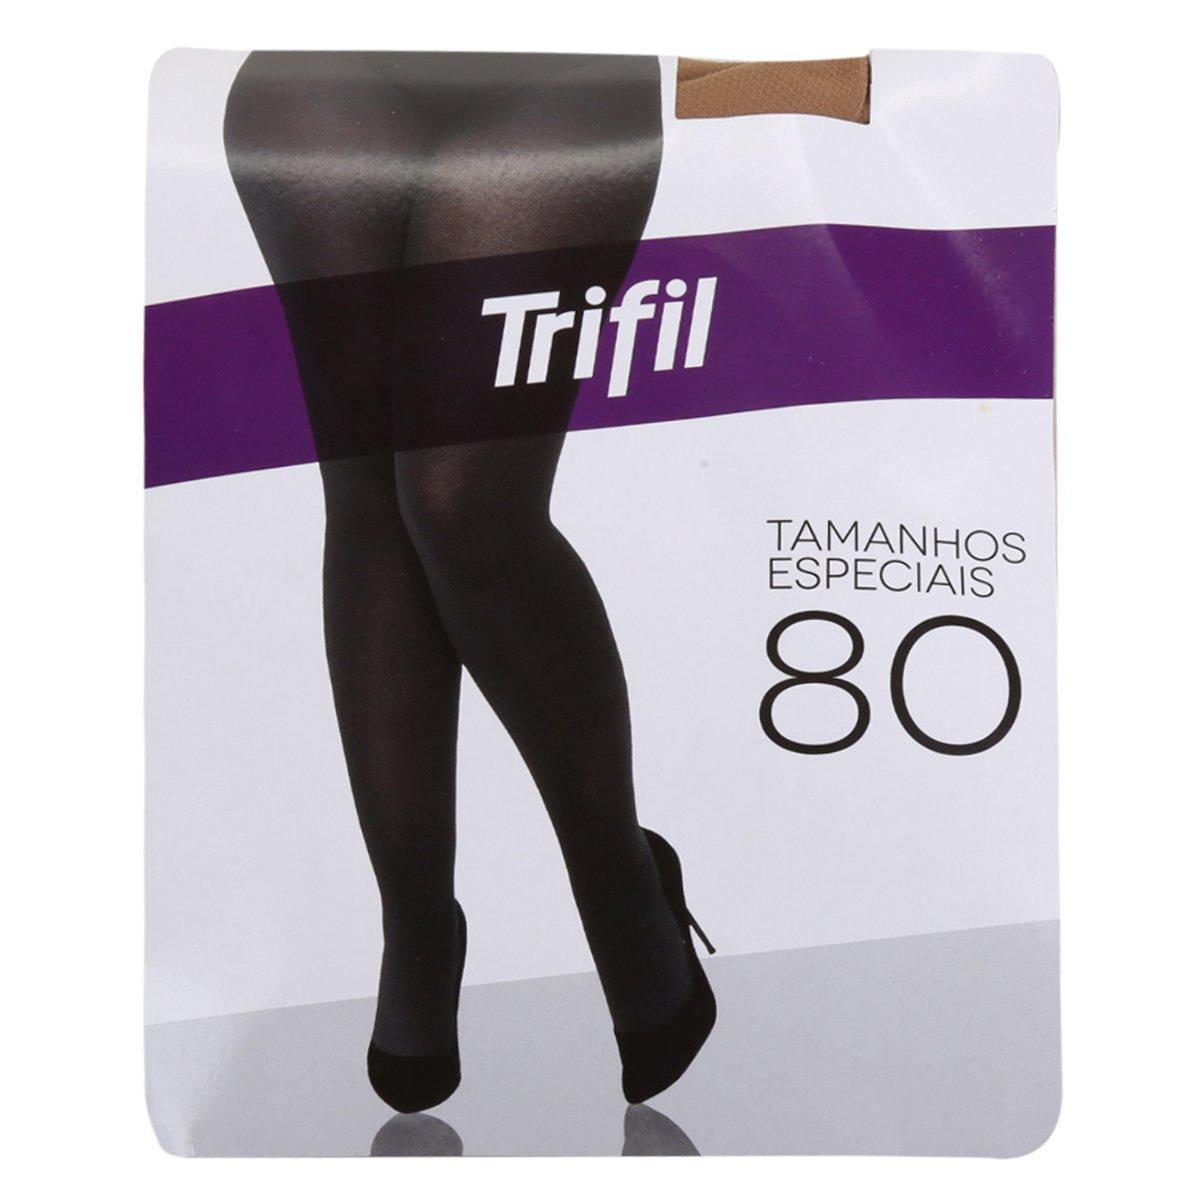 Meia Calça Trifil Plus Size Opaca Fio 80 Feminina